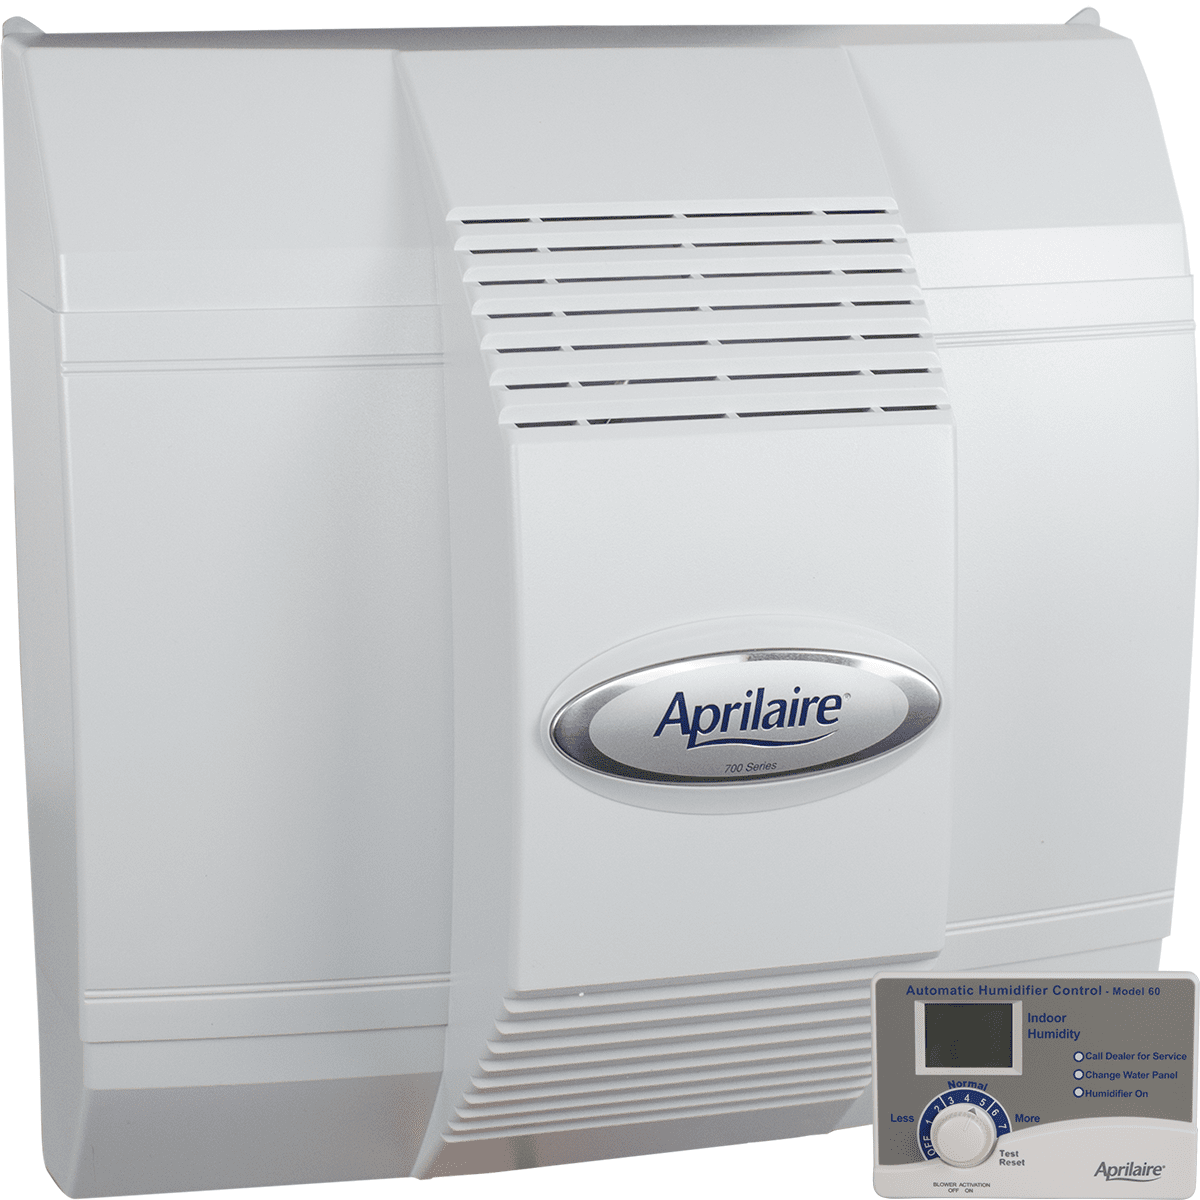 Aprilaire Model 700 High-capacity Humidifier - Auto Digital Control